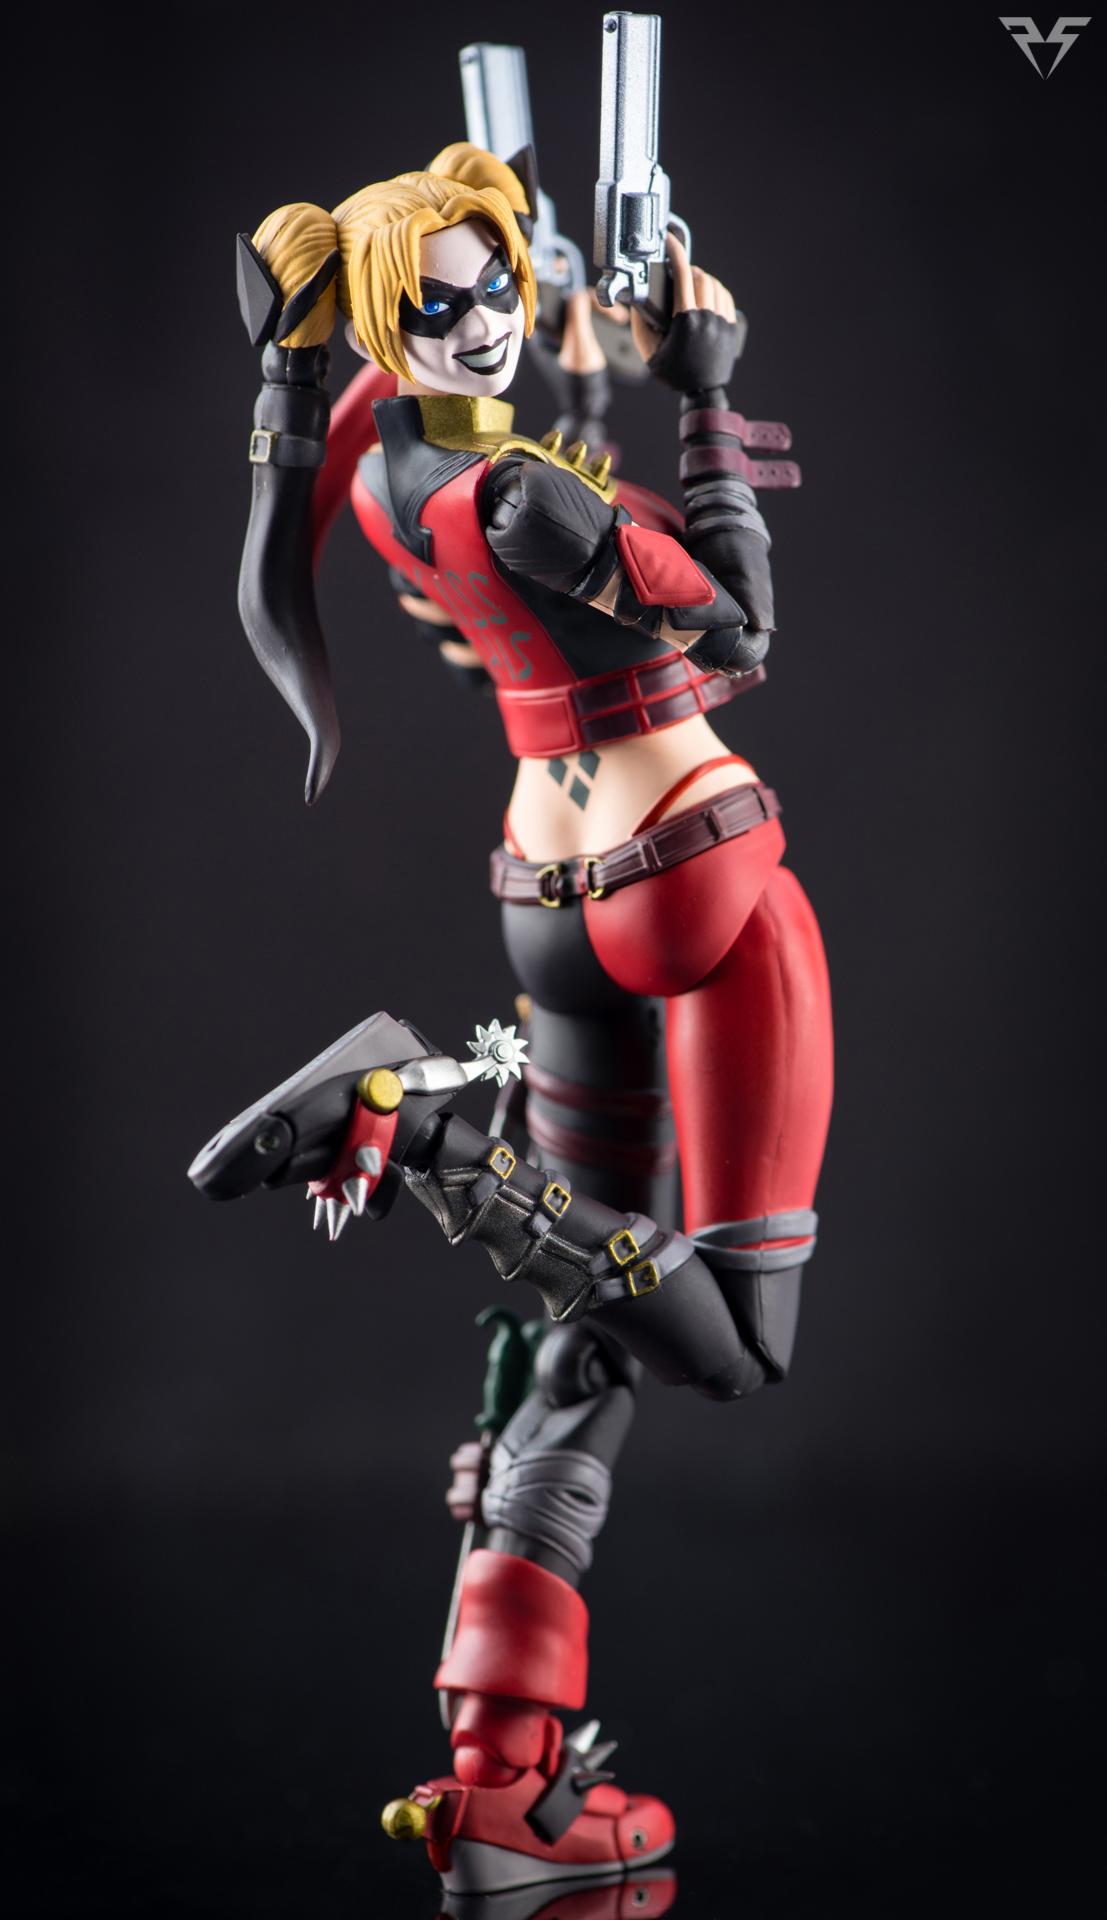 Figuarts Harley Quinn-24.jpg